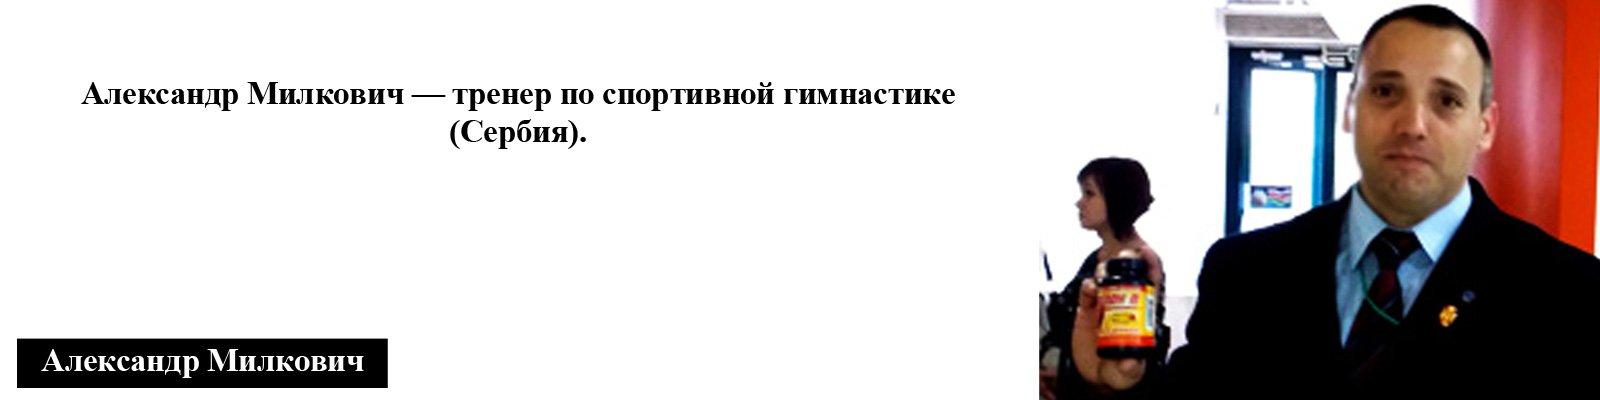 Александр Милкович - тренер по спортивной гимнастике.